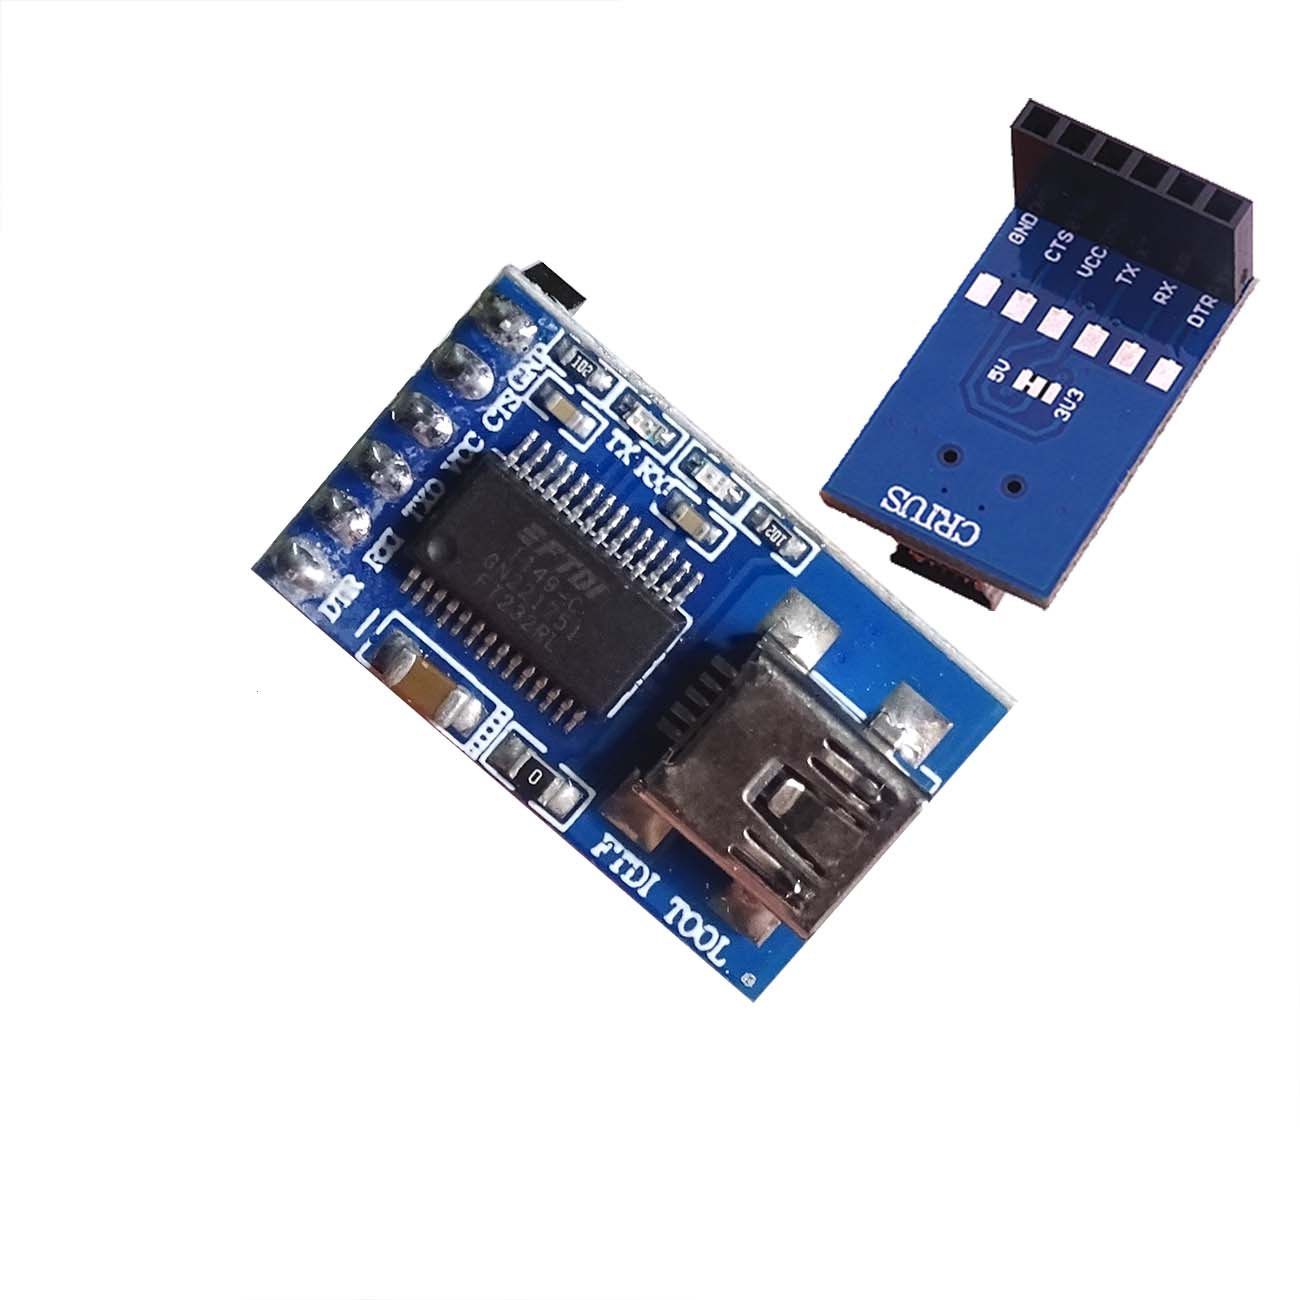 Active Components Integrated Circuits 1pcs Ftdi Basic 5v Usb To Ttl Mwc Programmer/serial Debugger/program To Upload Tool